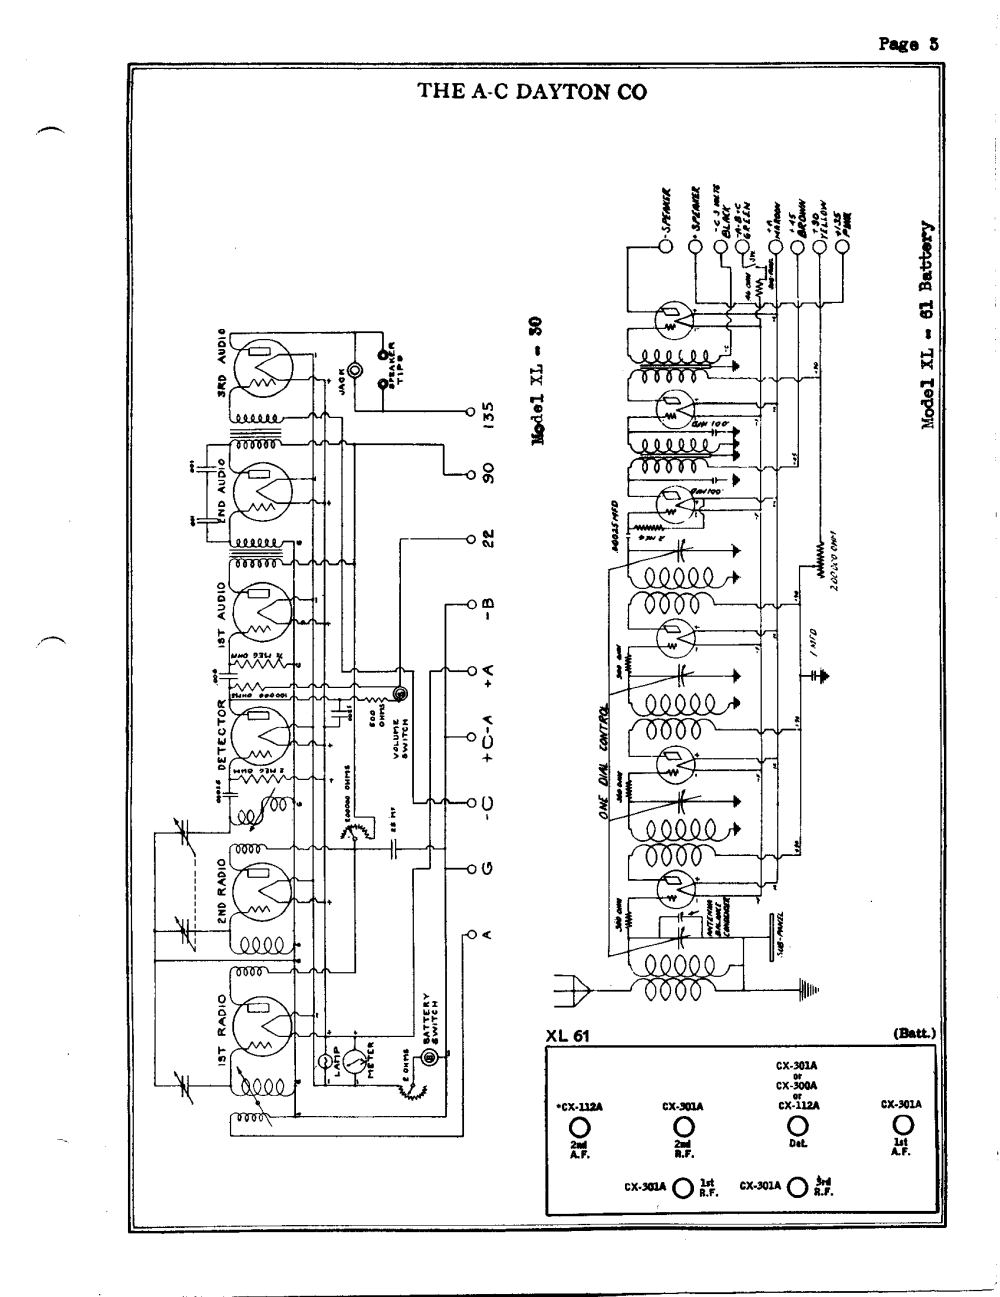 medium resolution of a c dayton company xl30 schematic